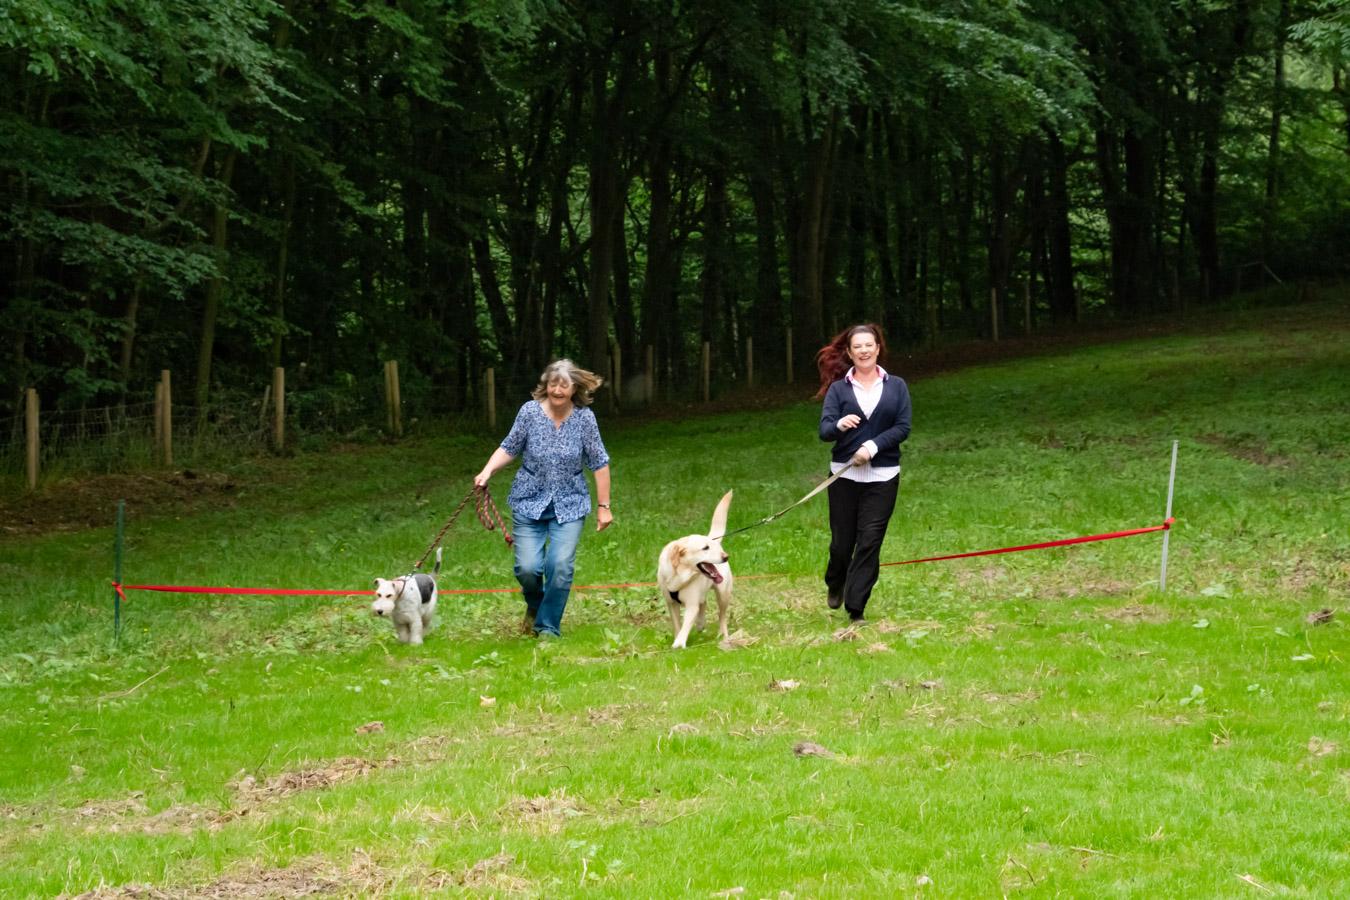 Monkton-Wyld-Best-Camping-Caravanning-West-Dorset-Dog-Friendly-Walk-8